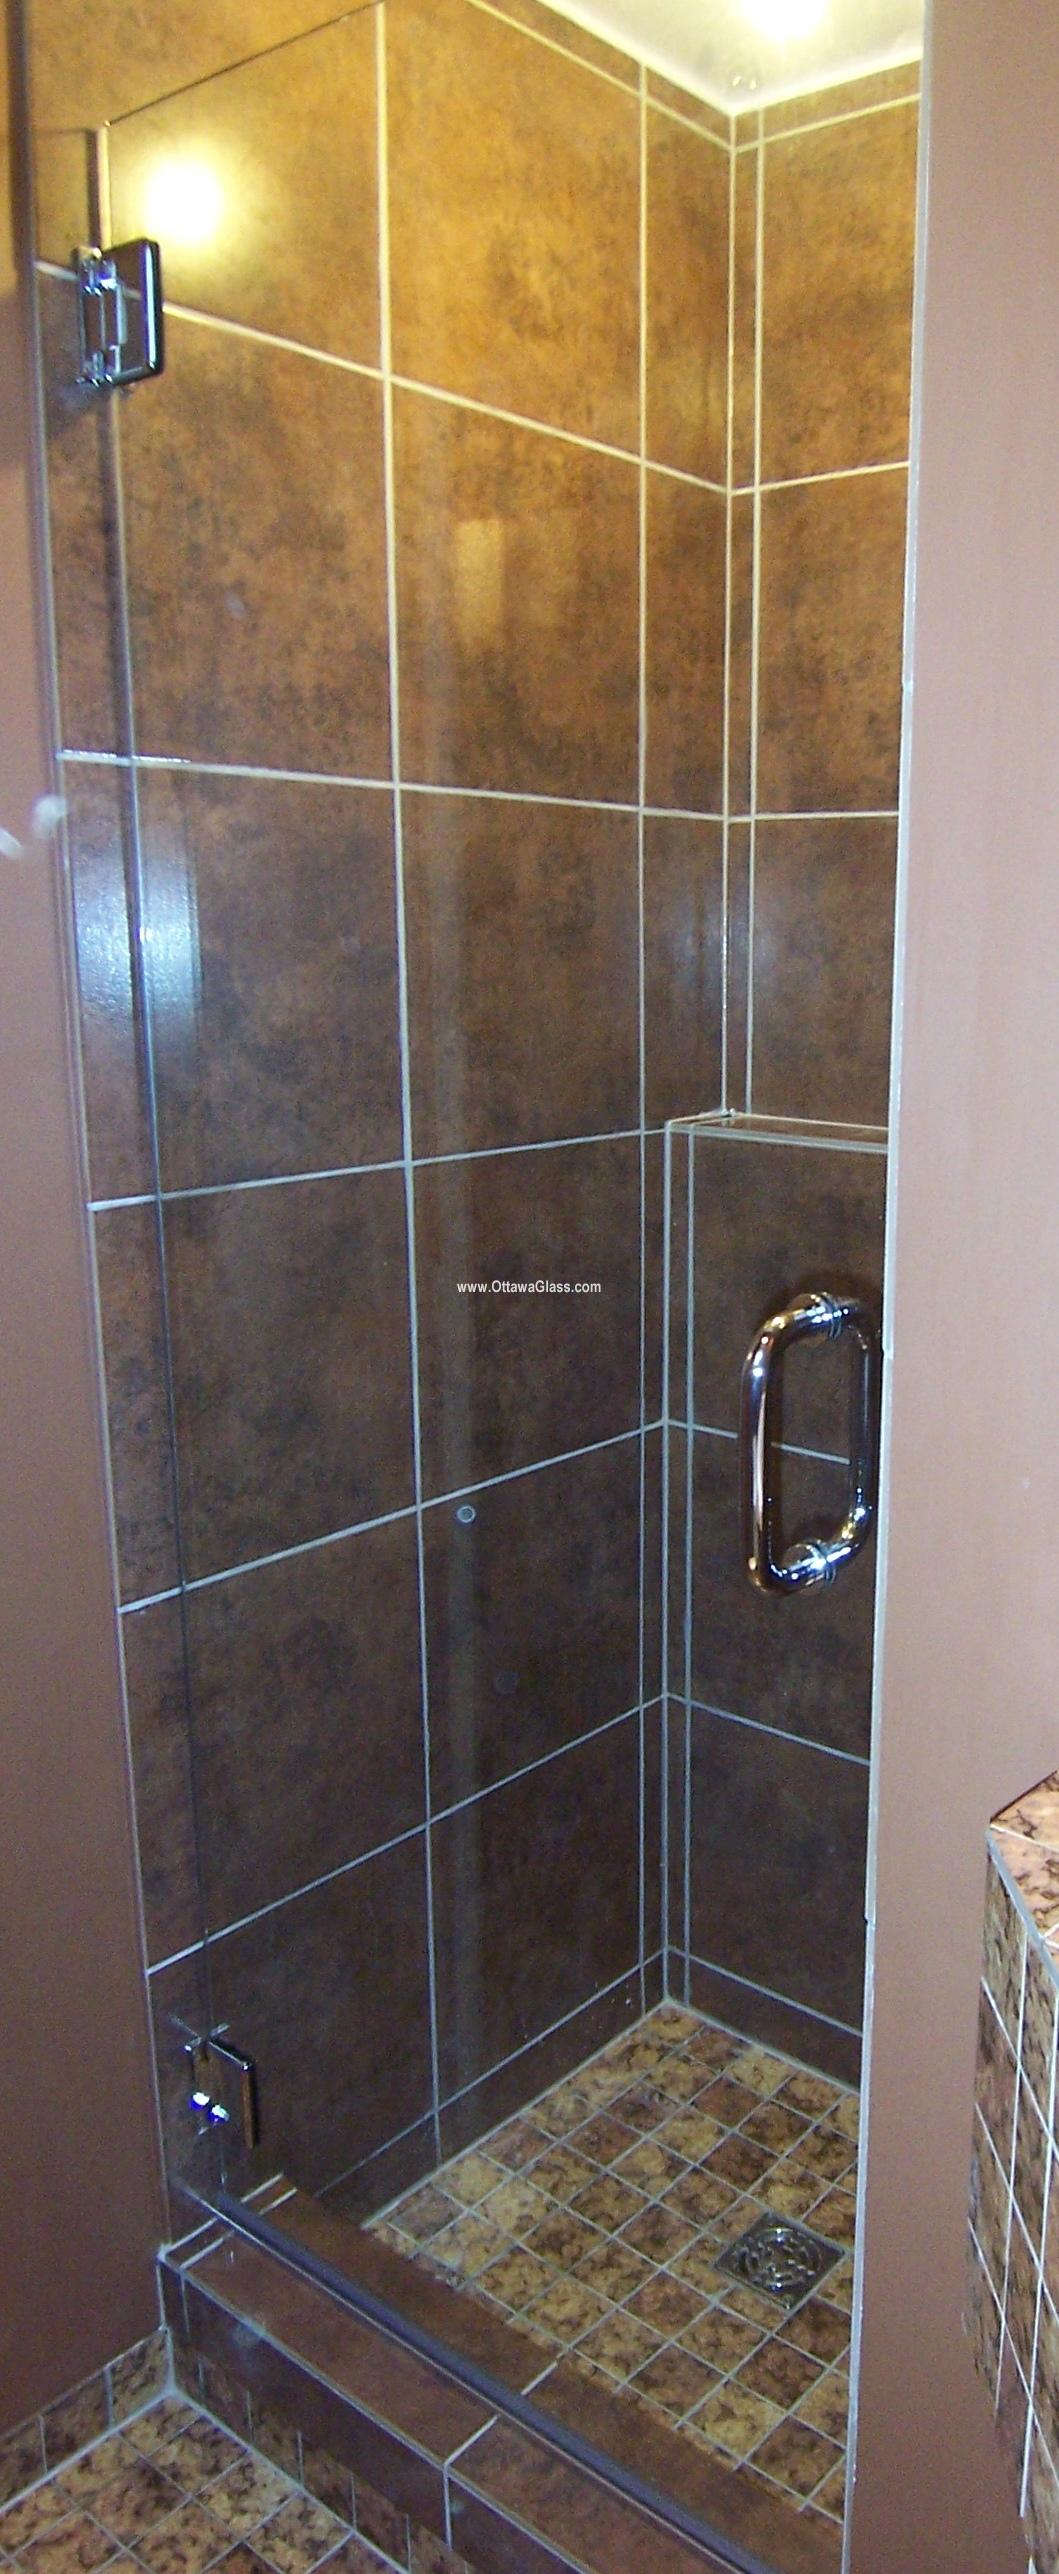 Ottawa Glass - Shower Hardware - Pictures